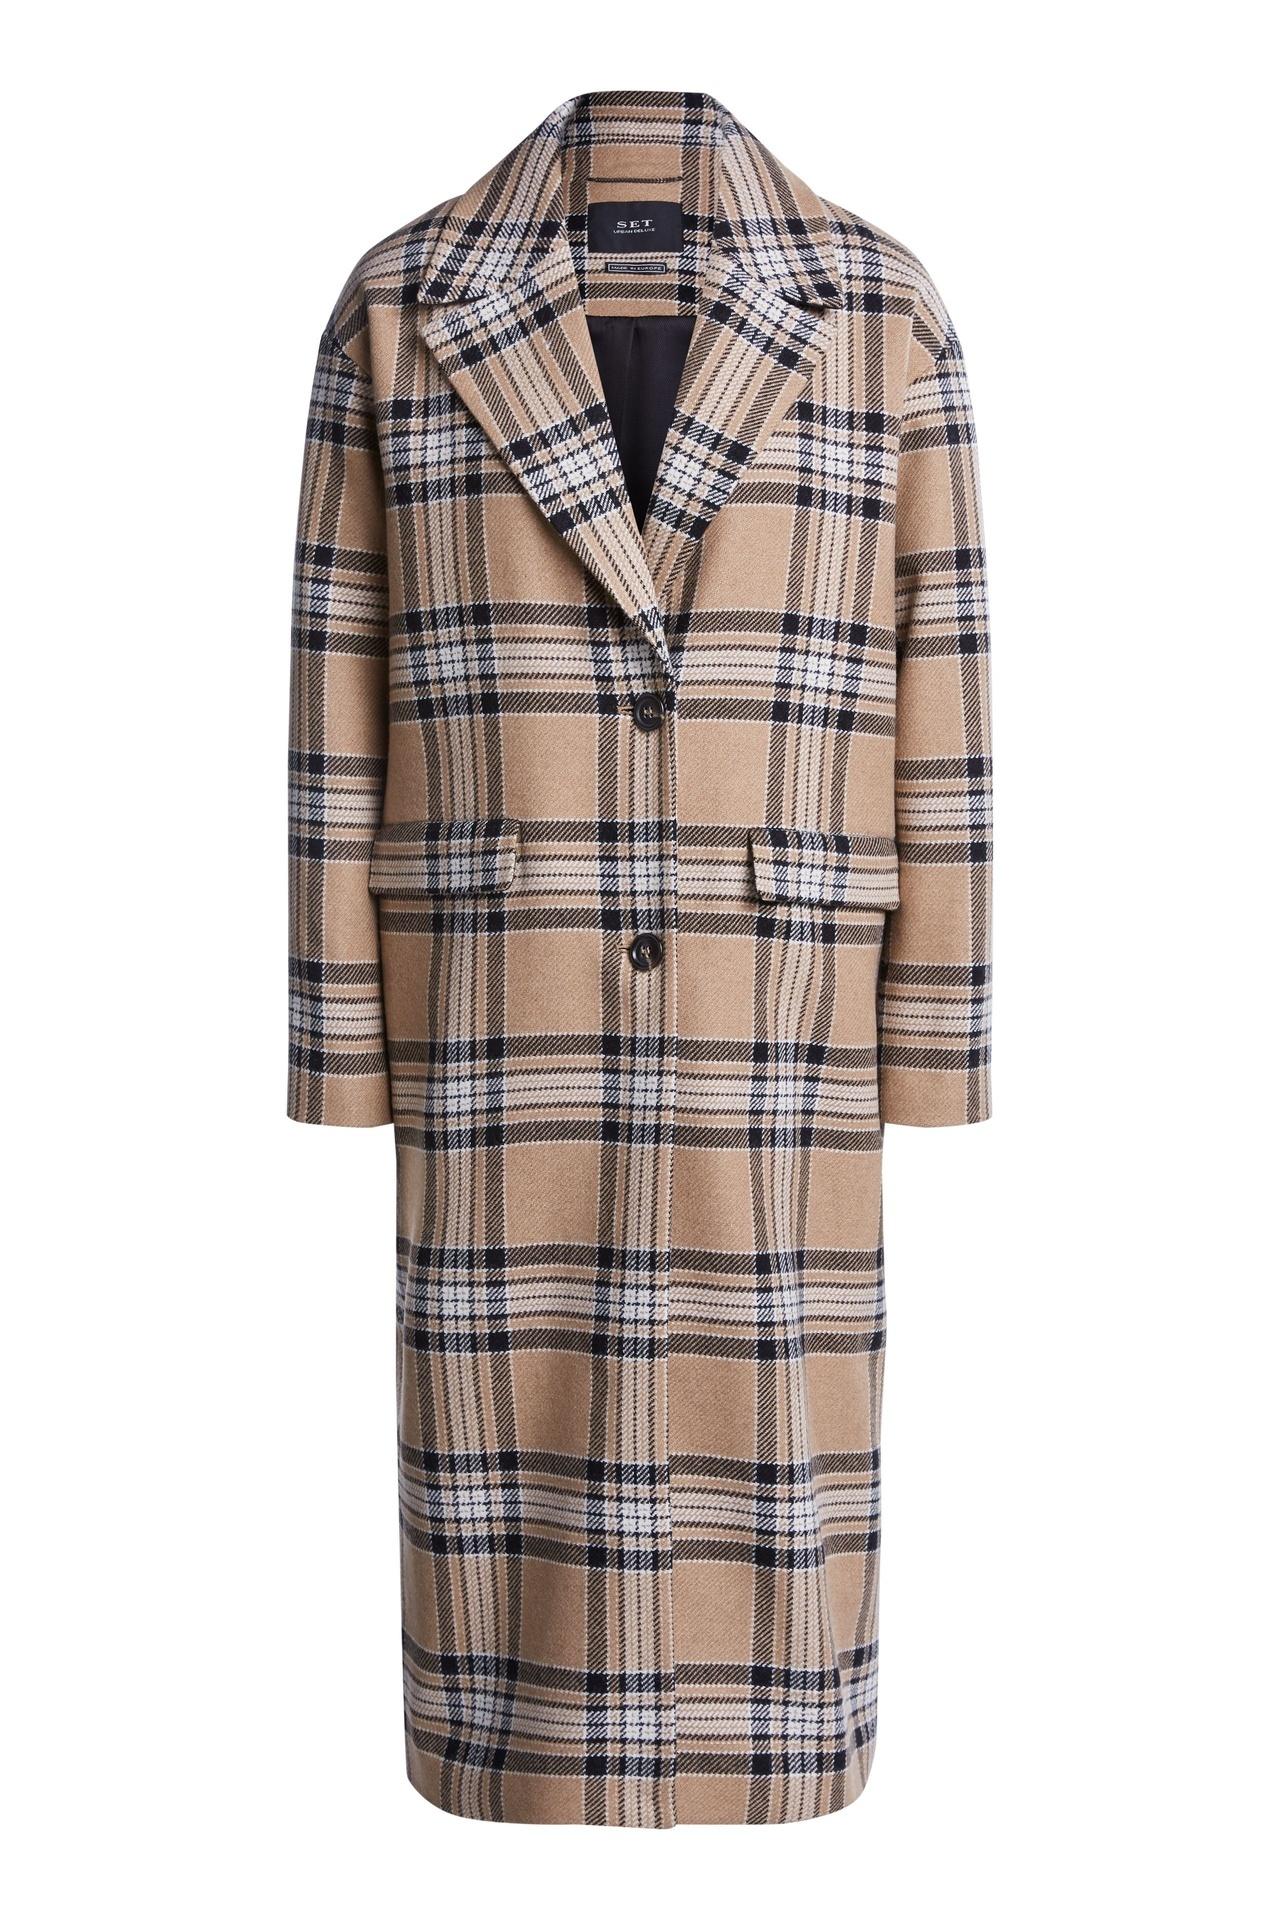 Coat check-1